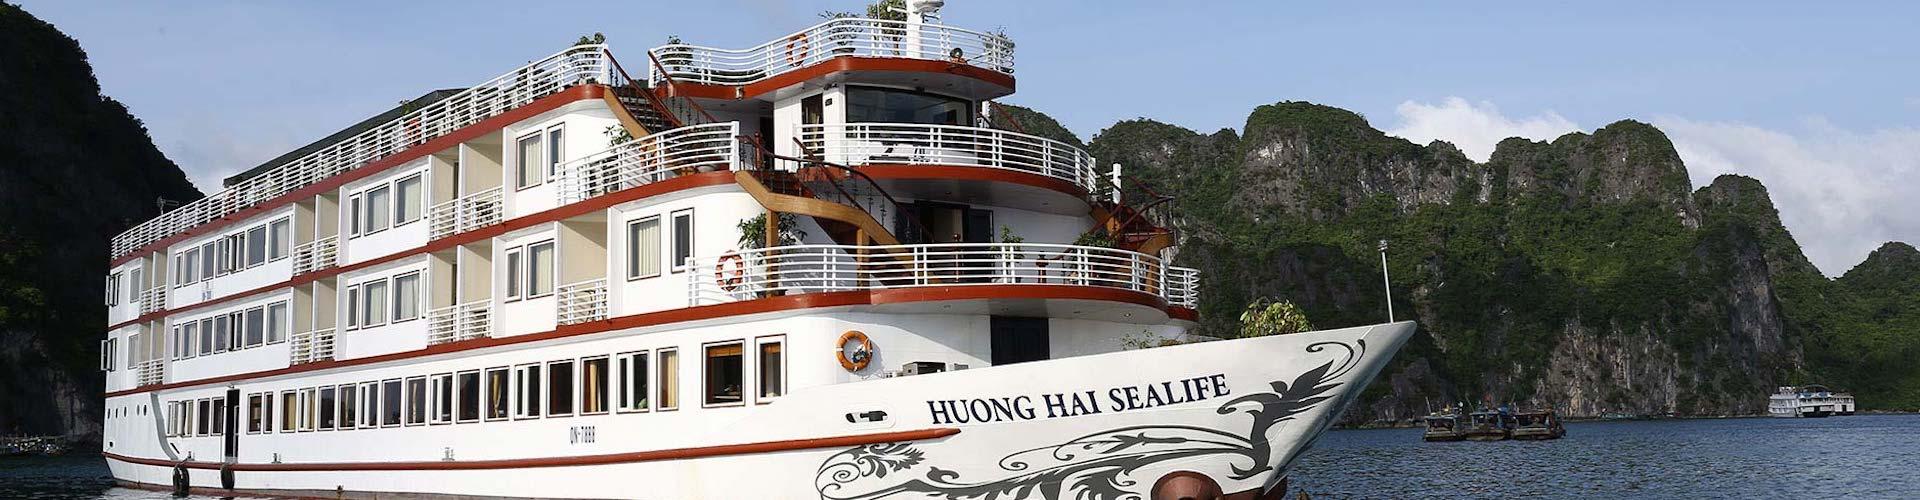 Fr-Huong Hai Sealife Cruise